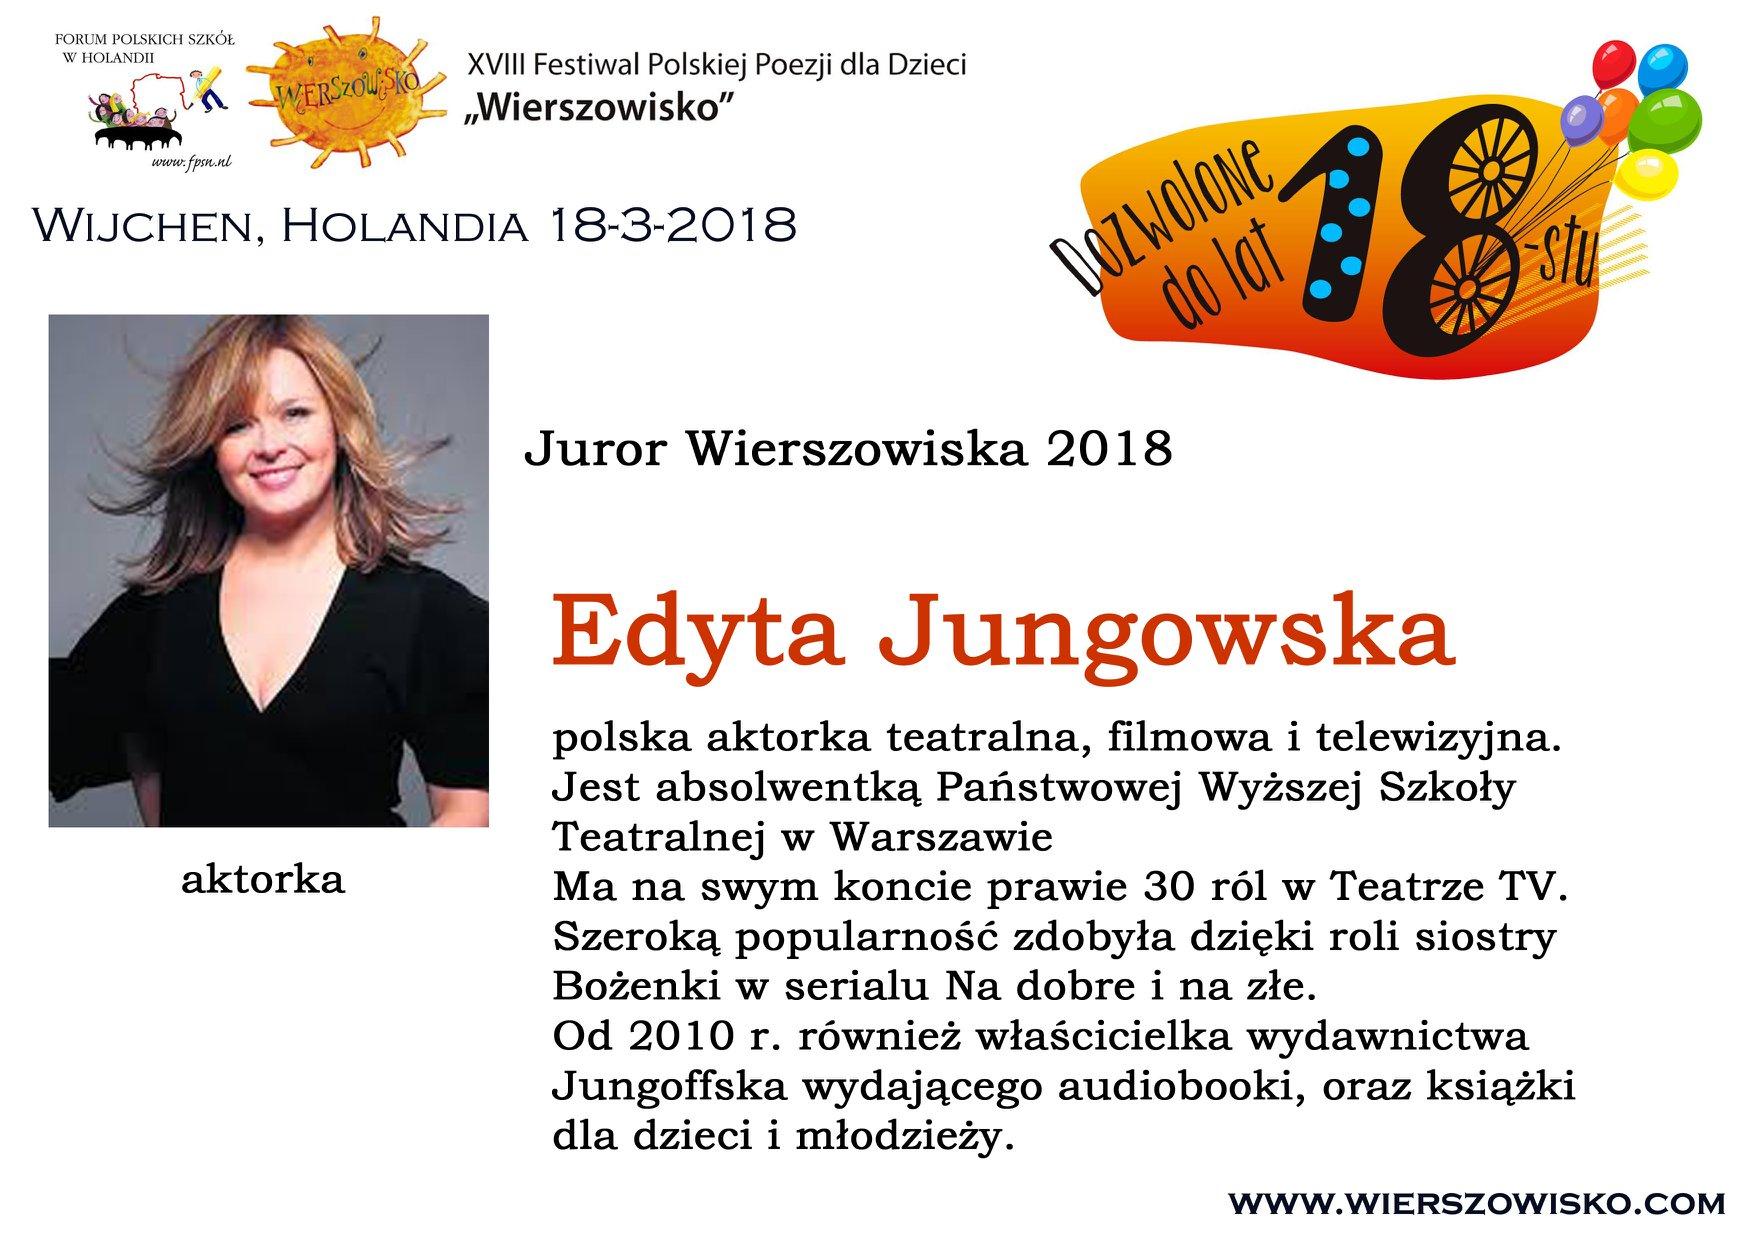 2. Edyta Junglowska